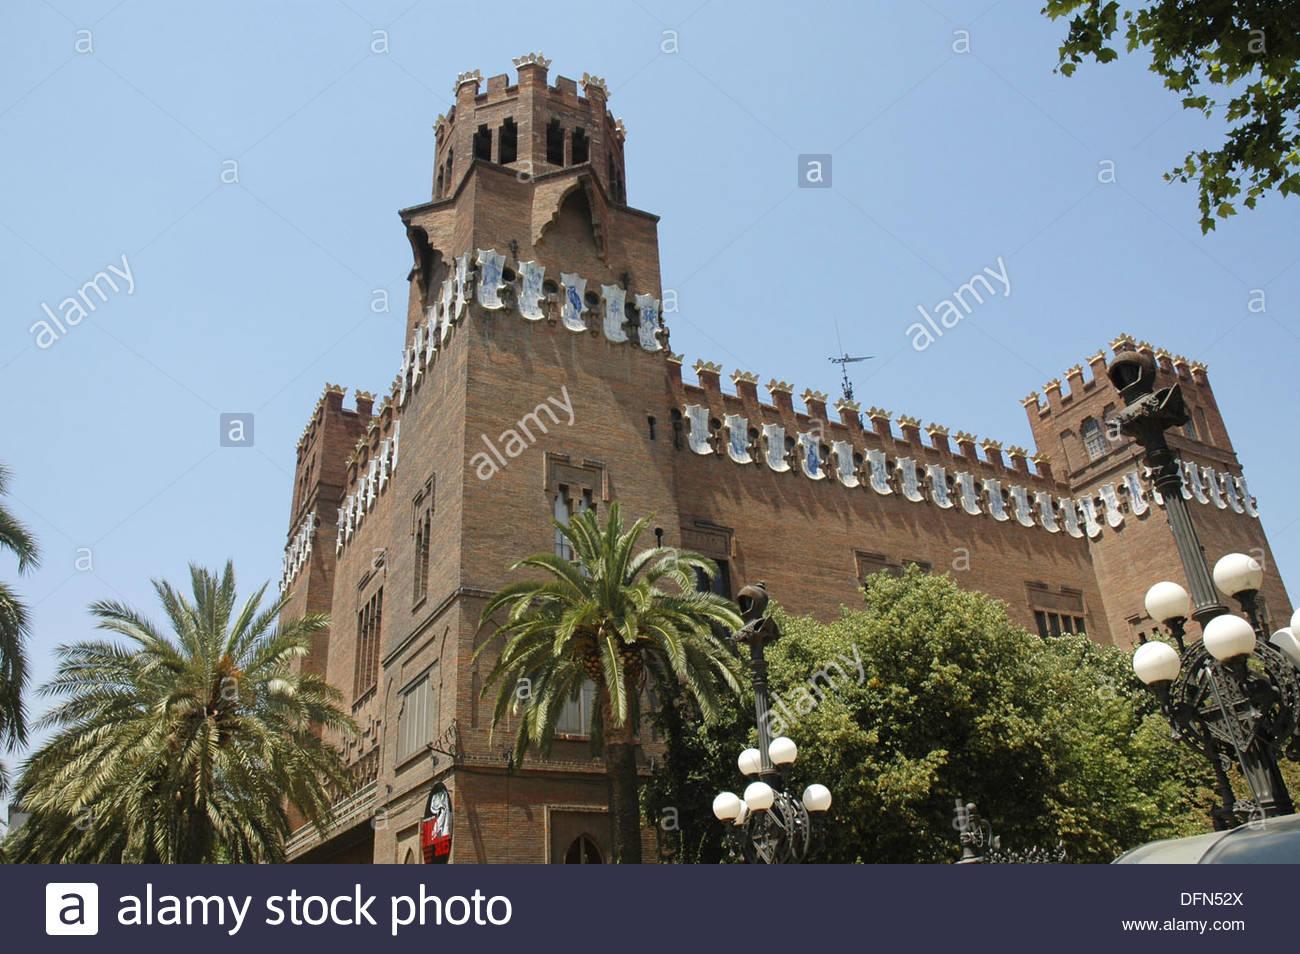 Zoology Museum. Ciutadella Park. Barcelona. Catalonia. Spain. - Stock Image